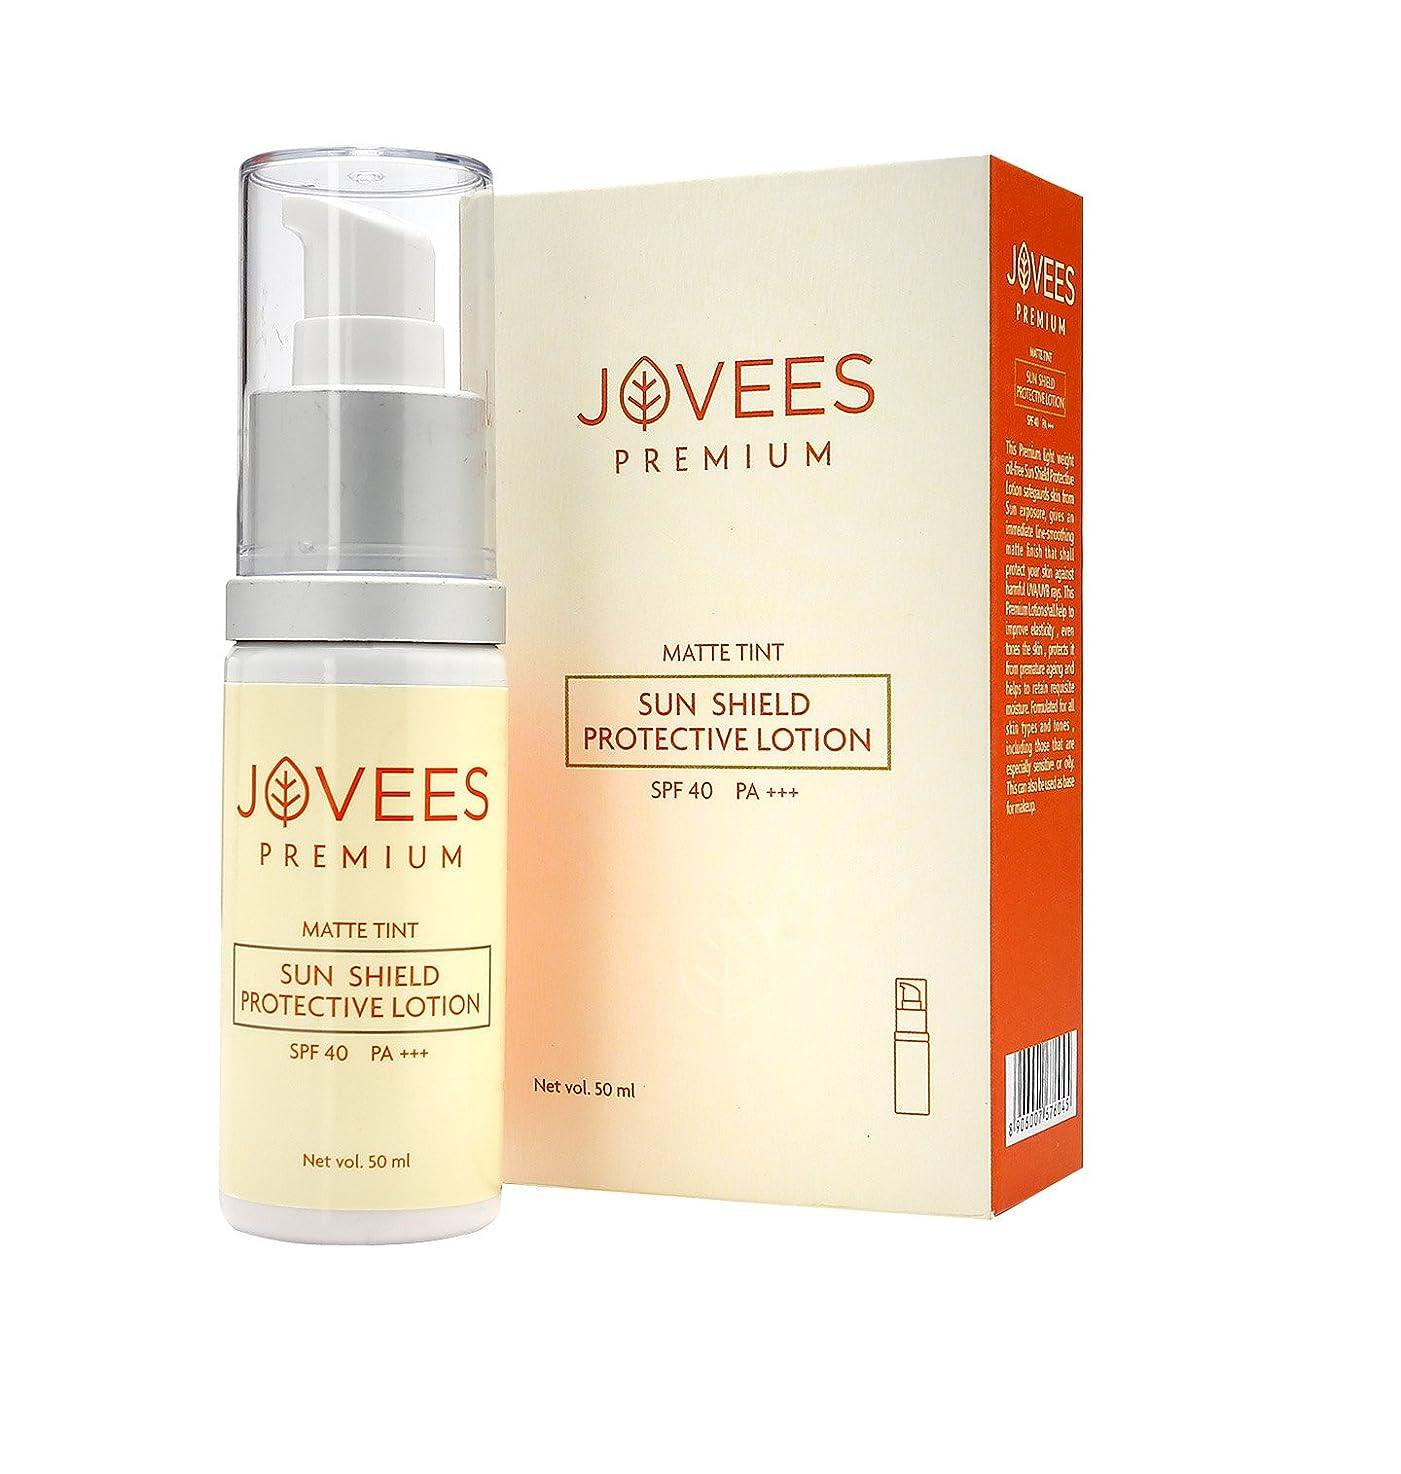 Jovees Premium Sun Shield Lotion, 50ml